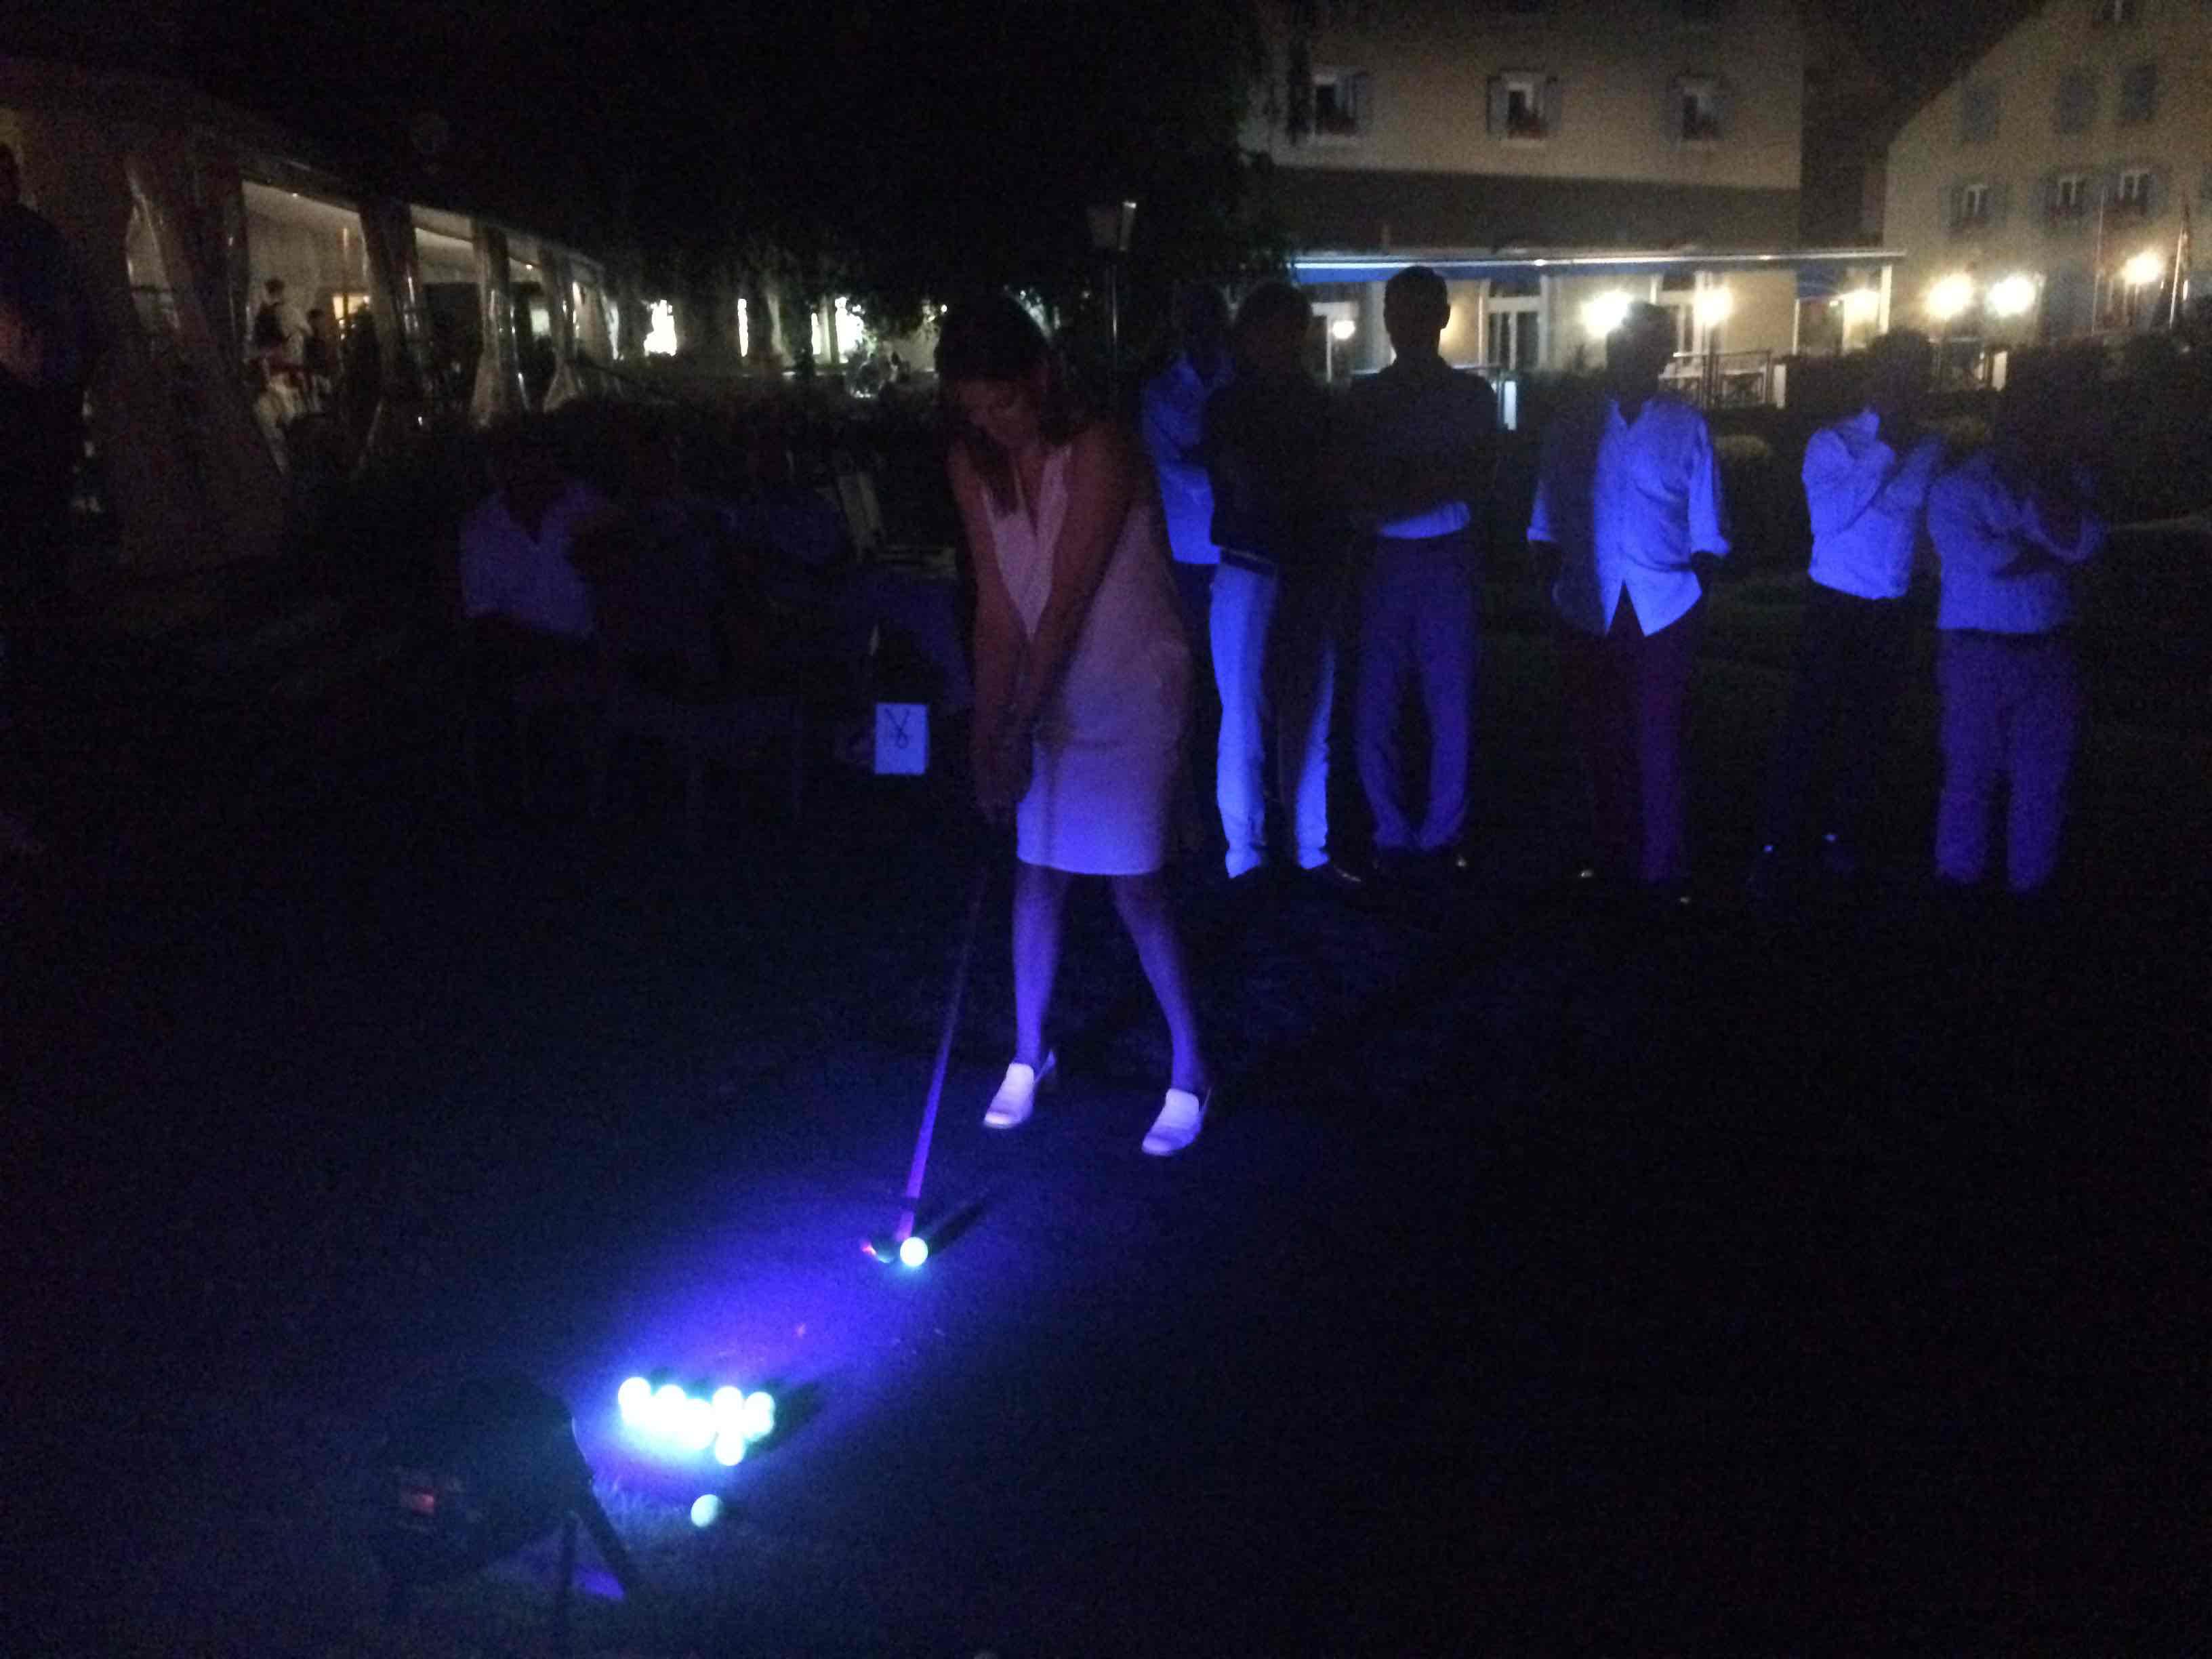 ASAGE Starlight Golf_joueuse tee box